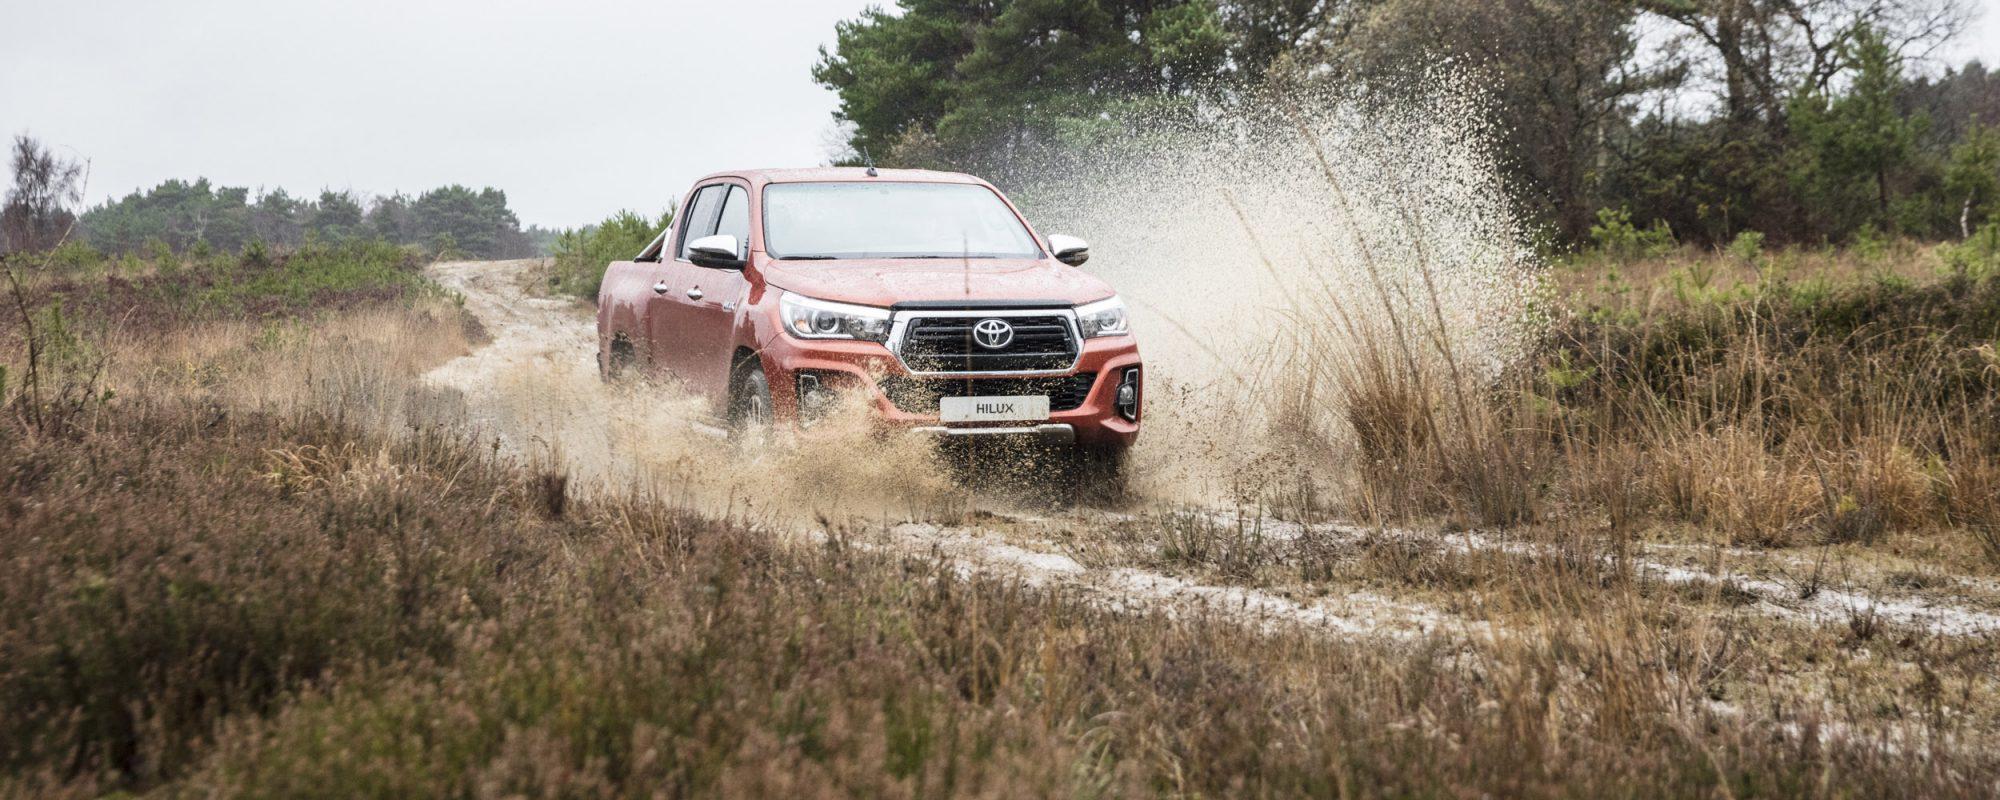 Toyota introduceert nieuwe extra stoere variant van icoon Hilux